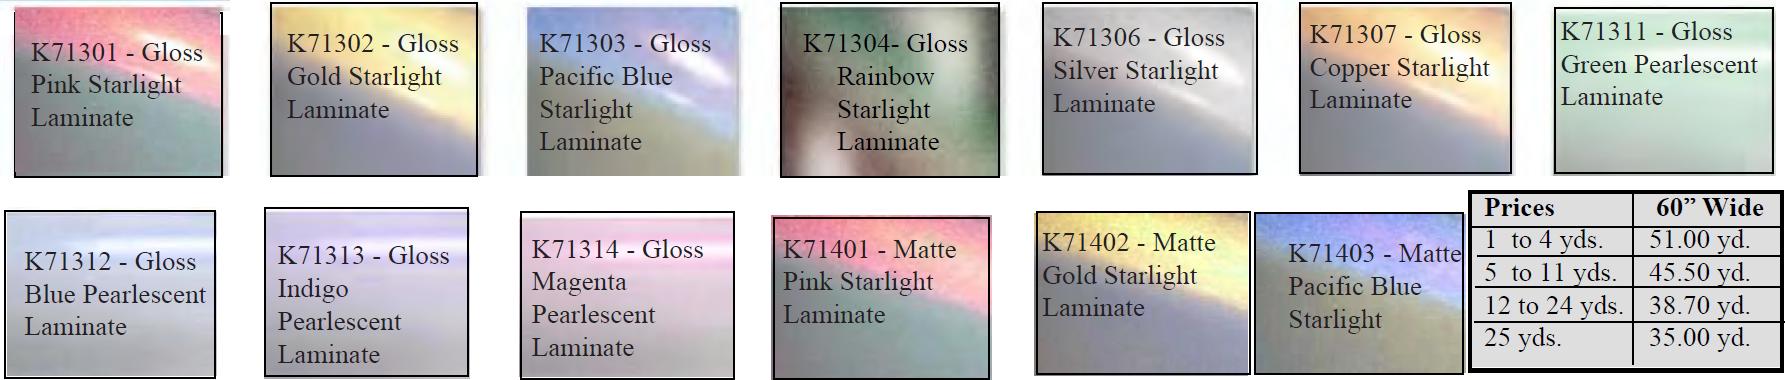 kpmf laminates for gallery